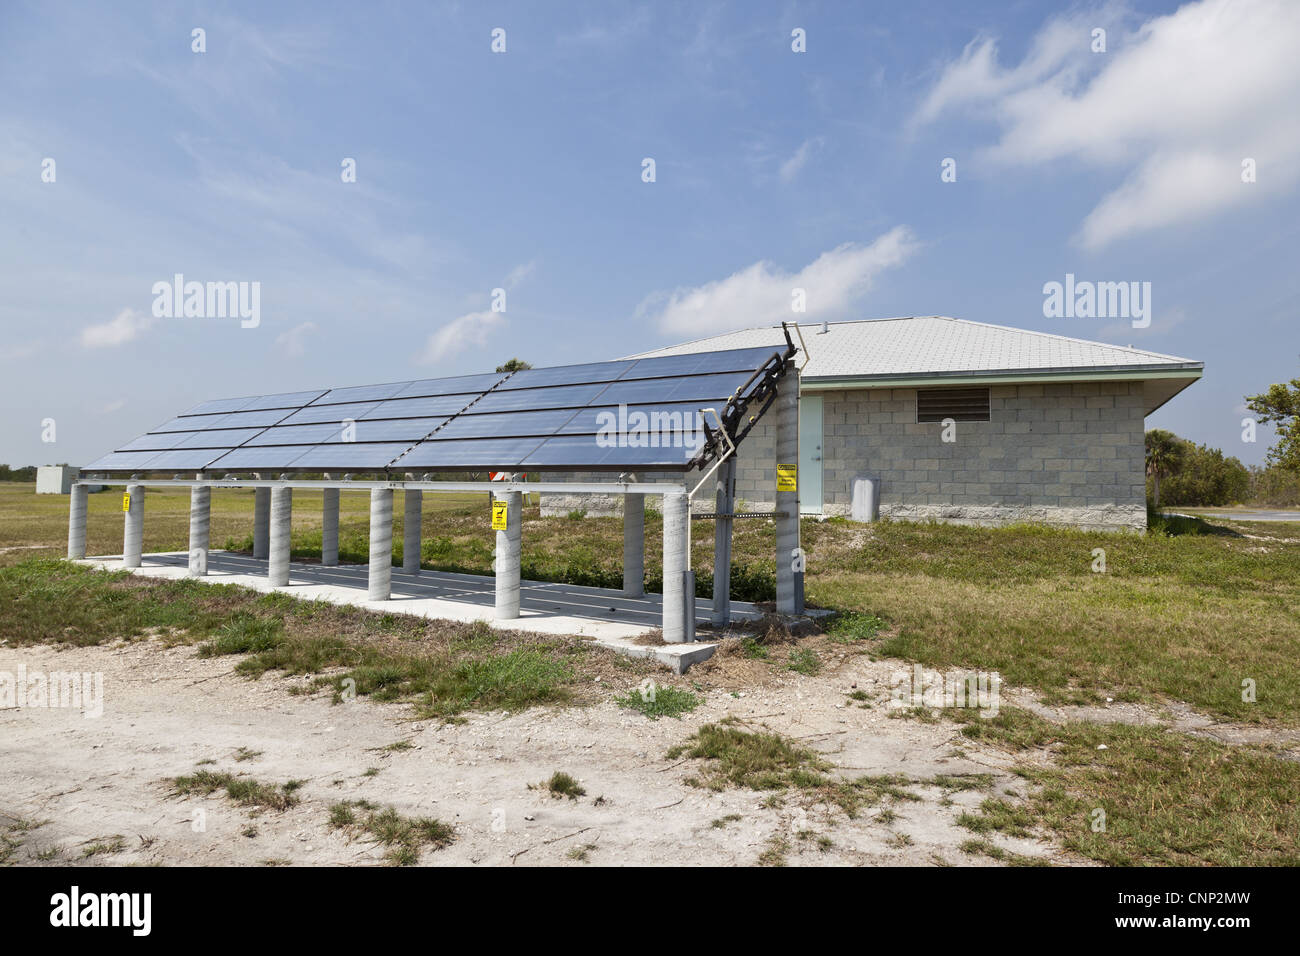 Array of solar panels providing power for public restrooms, Flamingo, Everglades N.P., Florida, U.S.A. - Stock Image